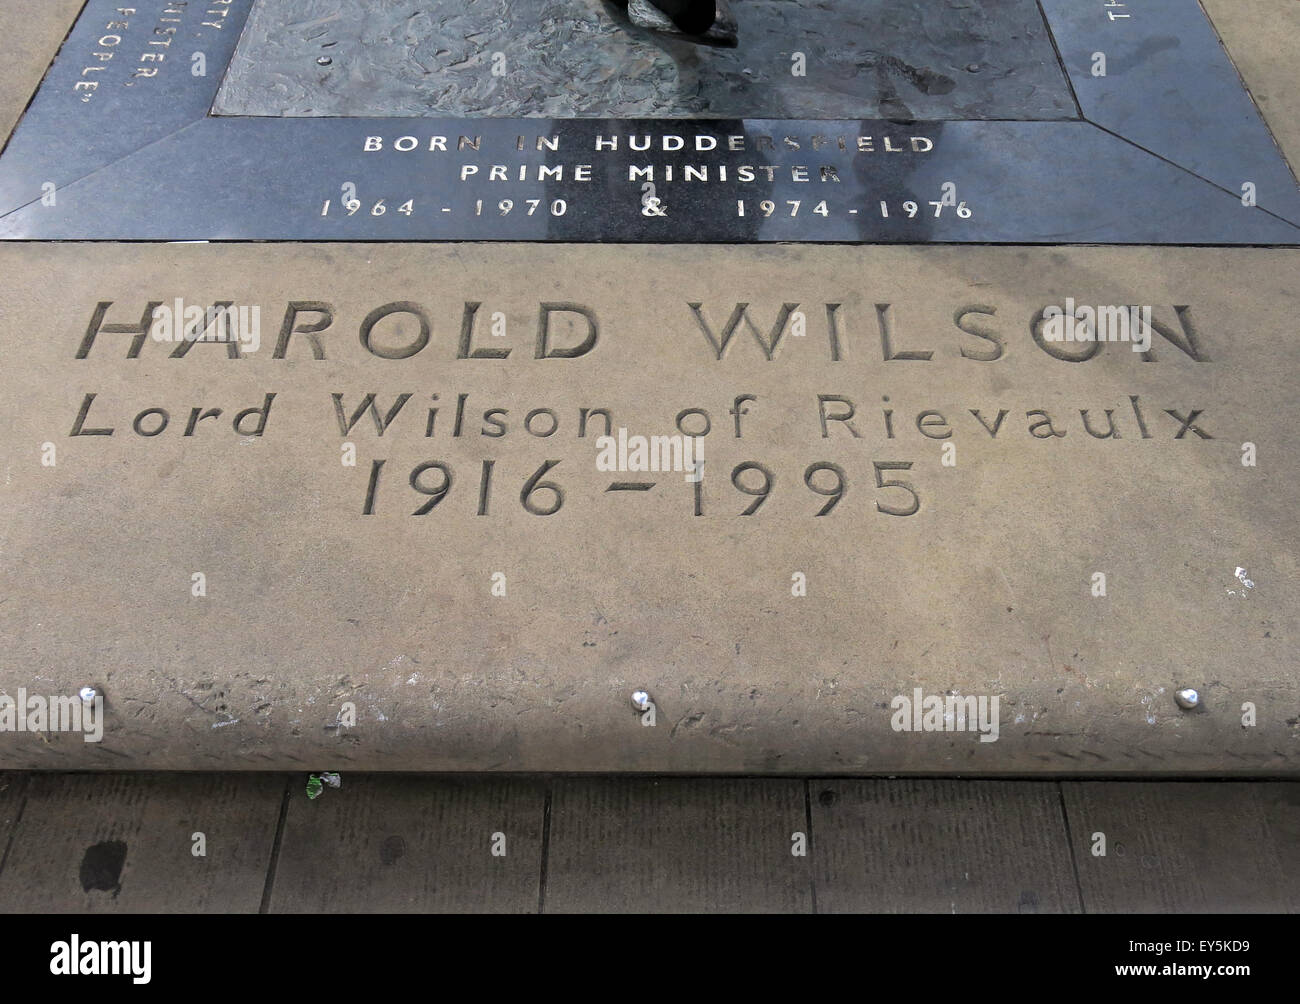 Laden Sie dieses Alamy Stockfoto Lord Harold Wilson of Rievaulx 1916-1995 Statue Inschrift, Huddersfield, West Yorks, England, UK - EY5KD9